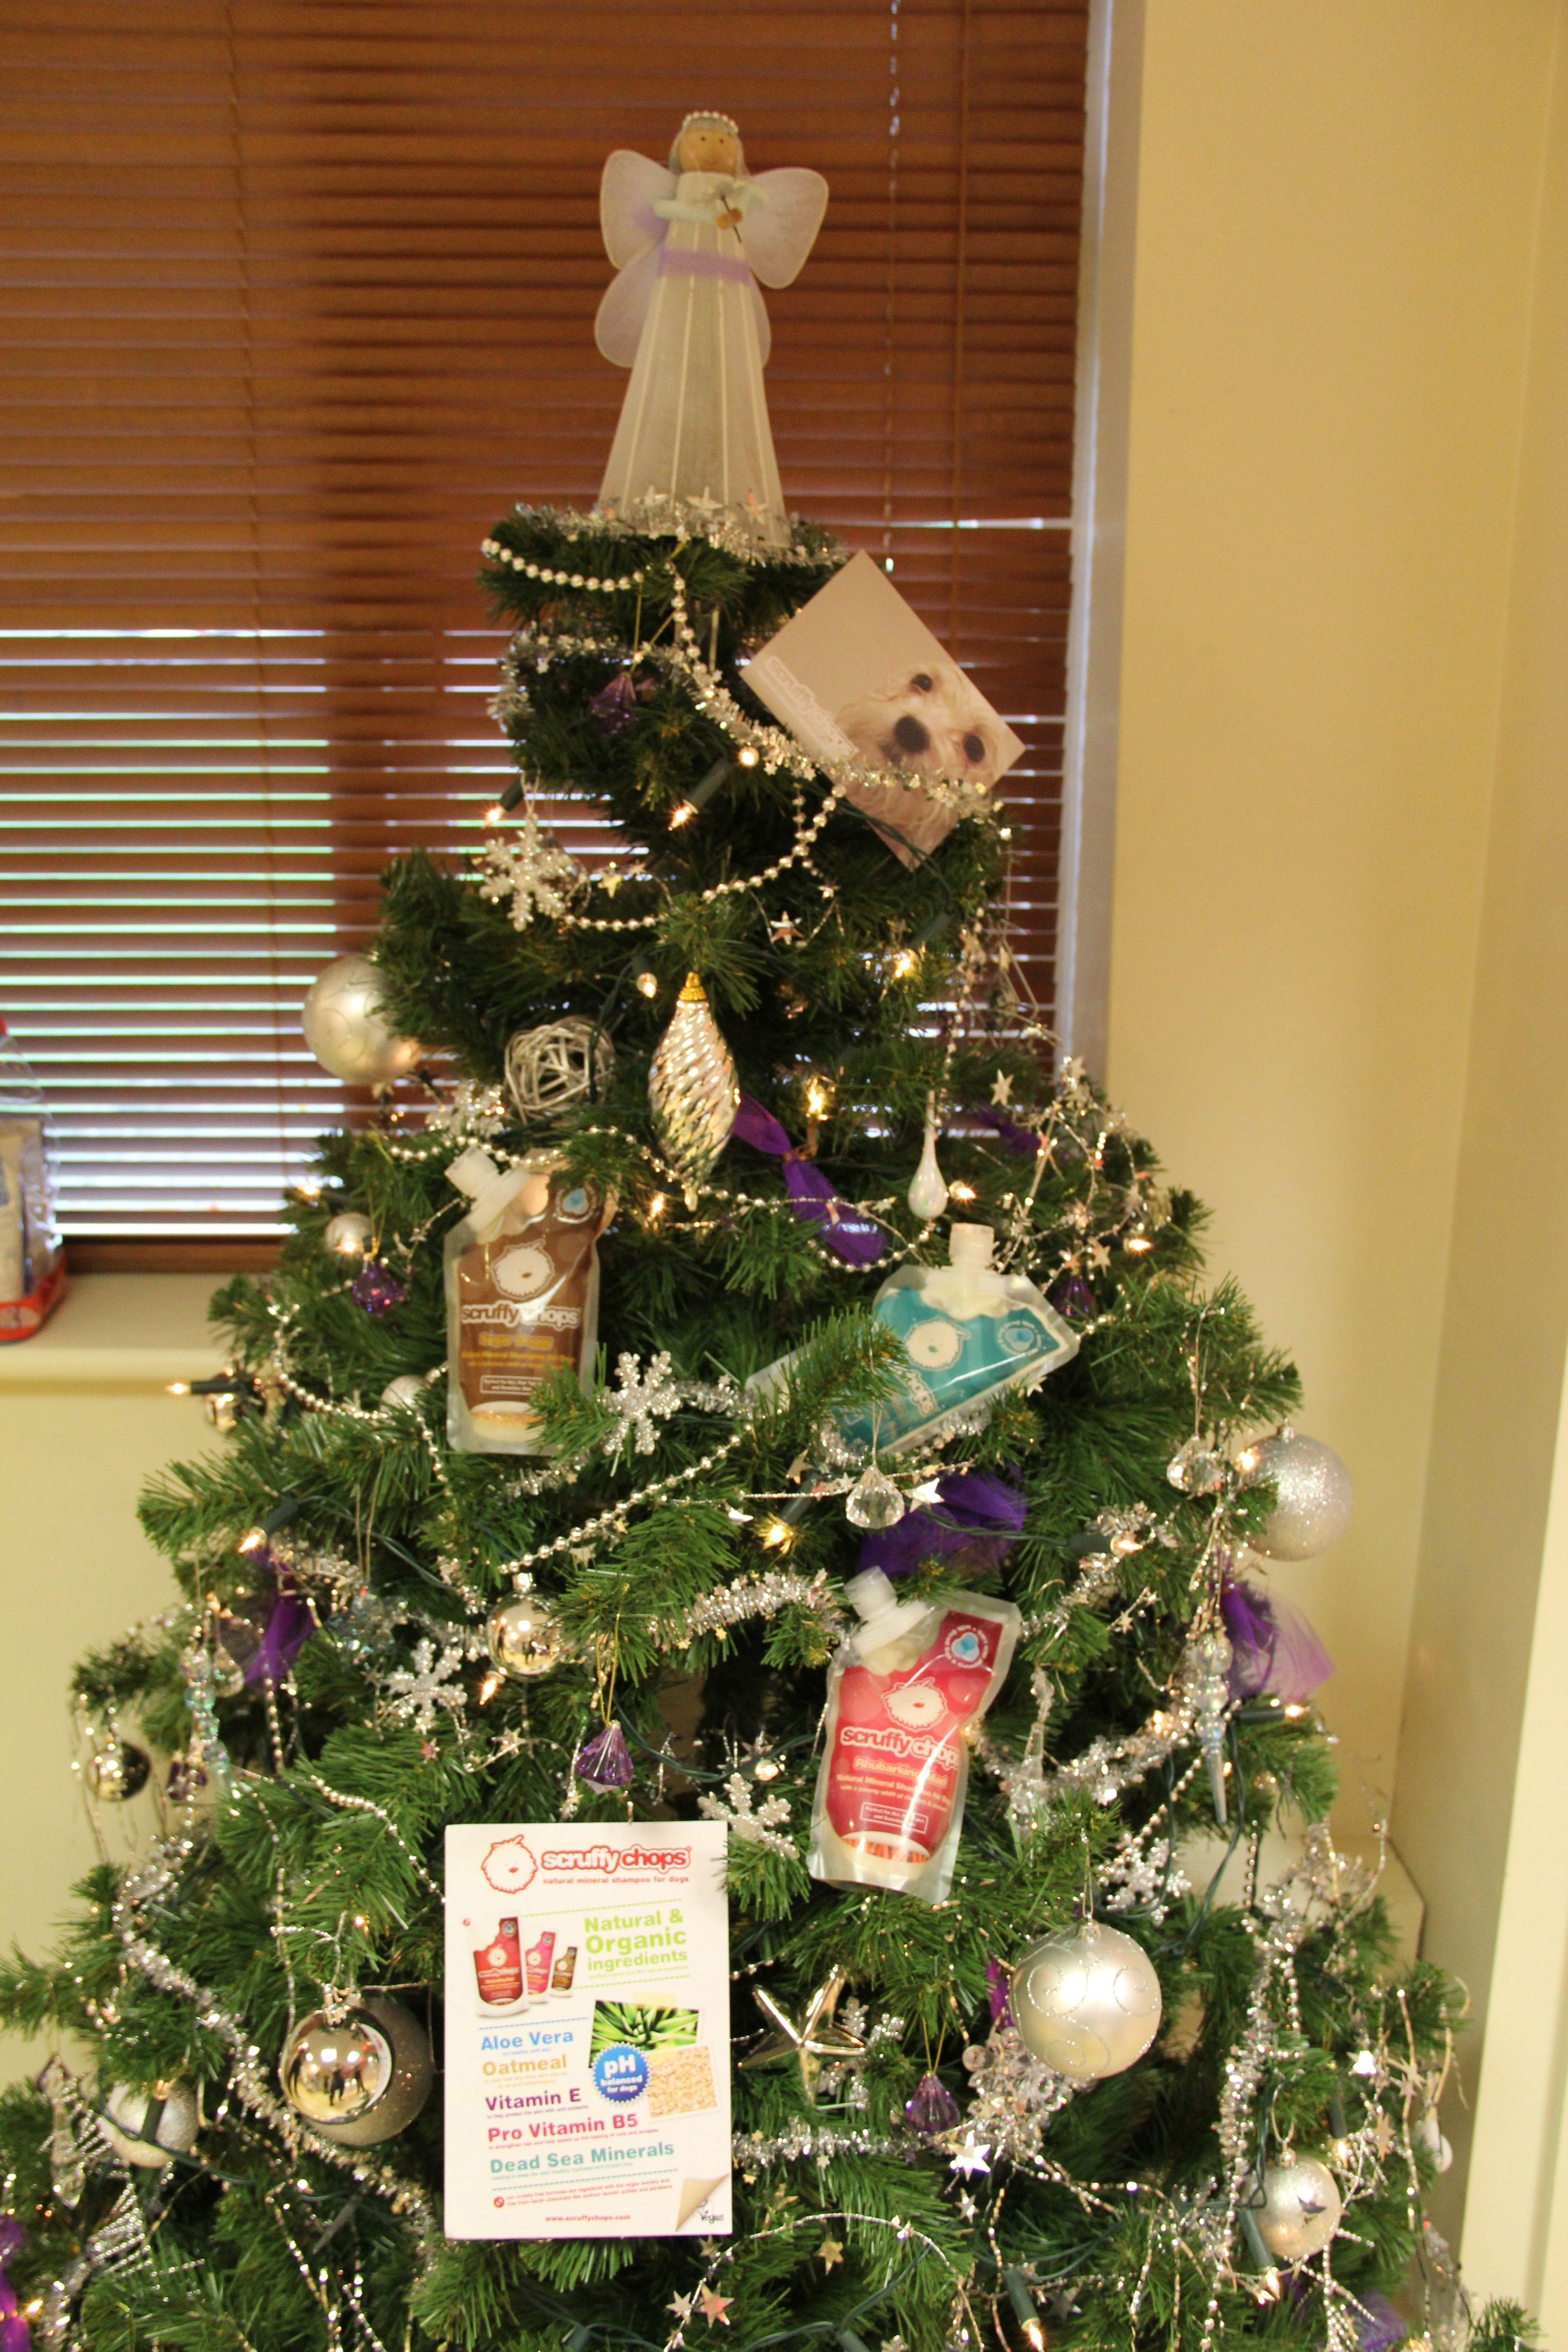 The Scruffychops Tree Dog Shampoo Holiday Decor Skincare Ingredients